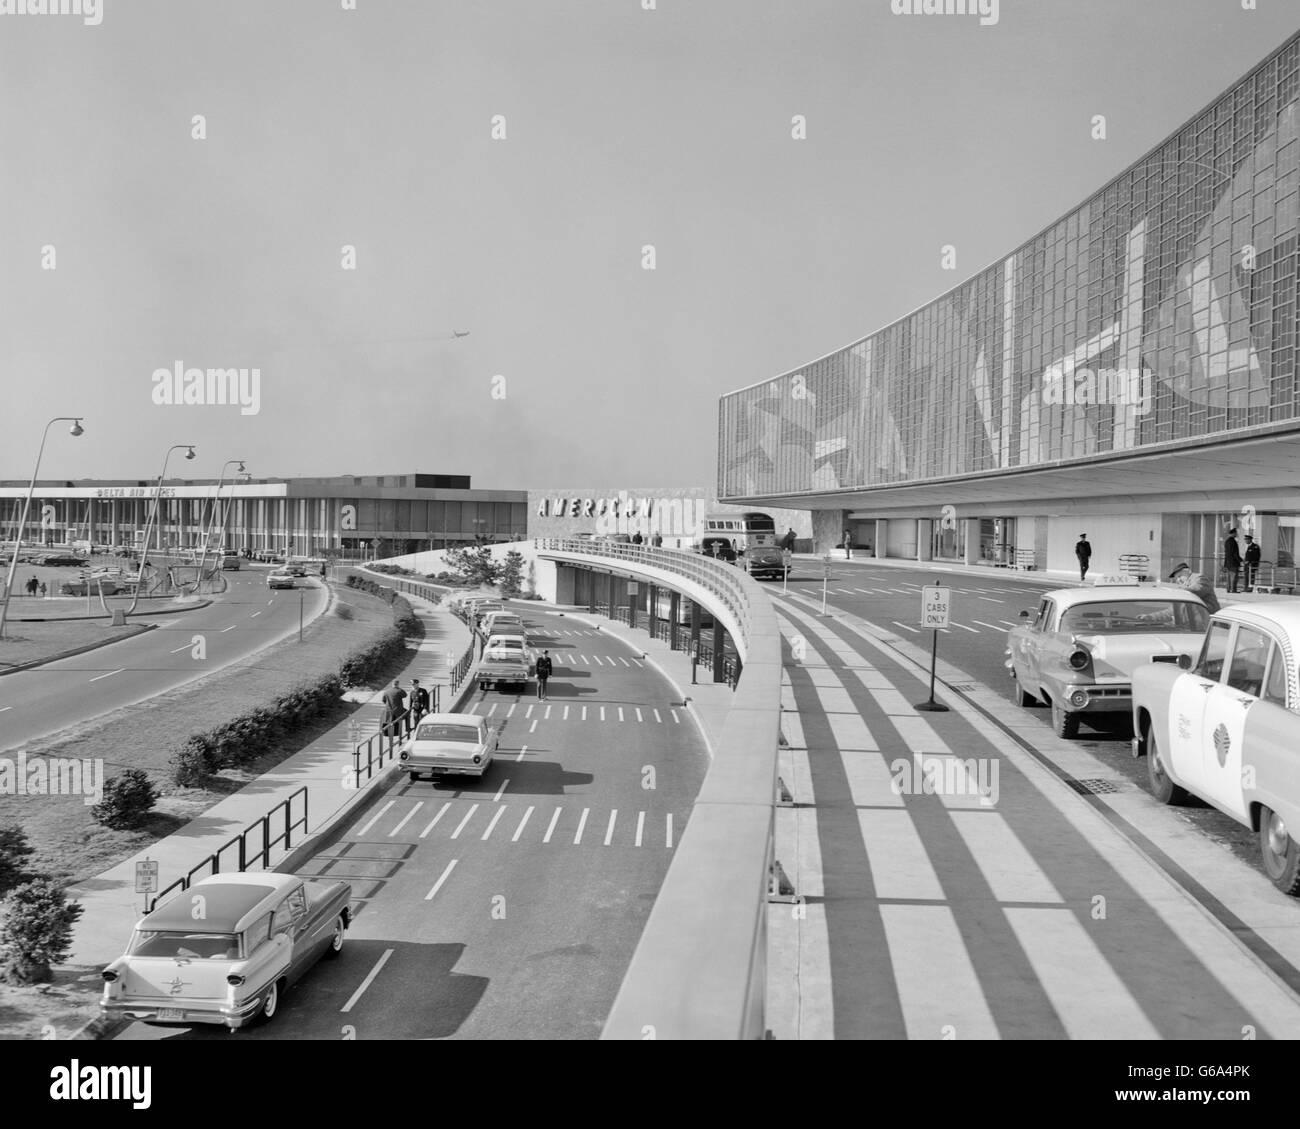 Aeroporto Jfk : Anni sessanta american airlines terminale jet edoardo vianello ora